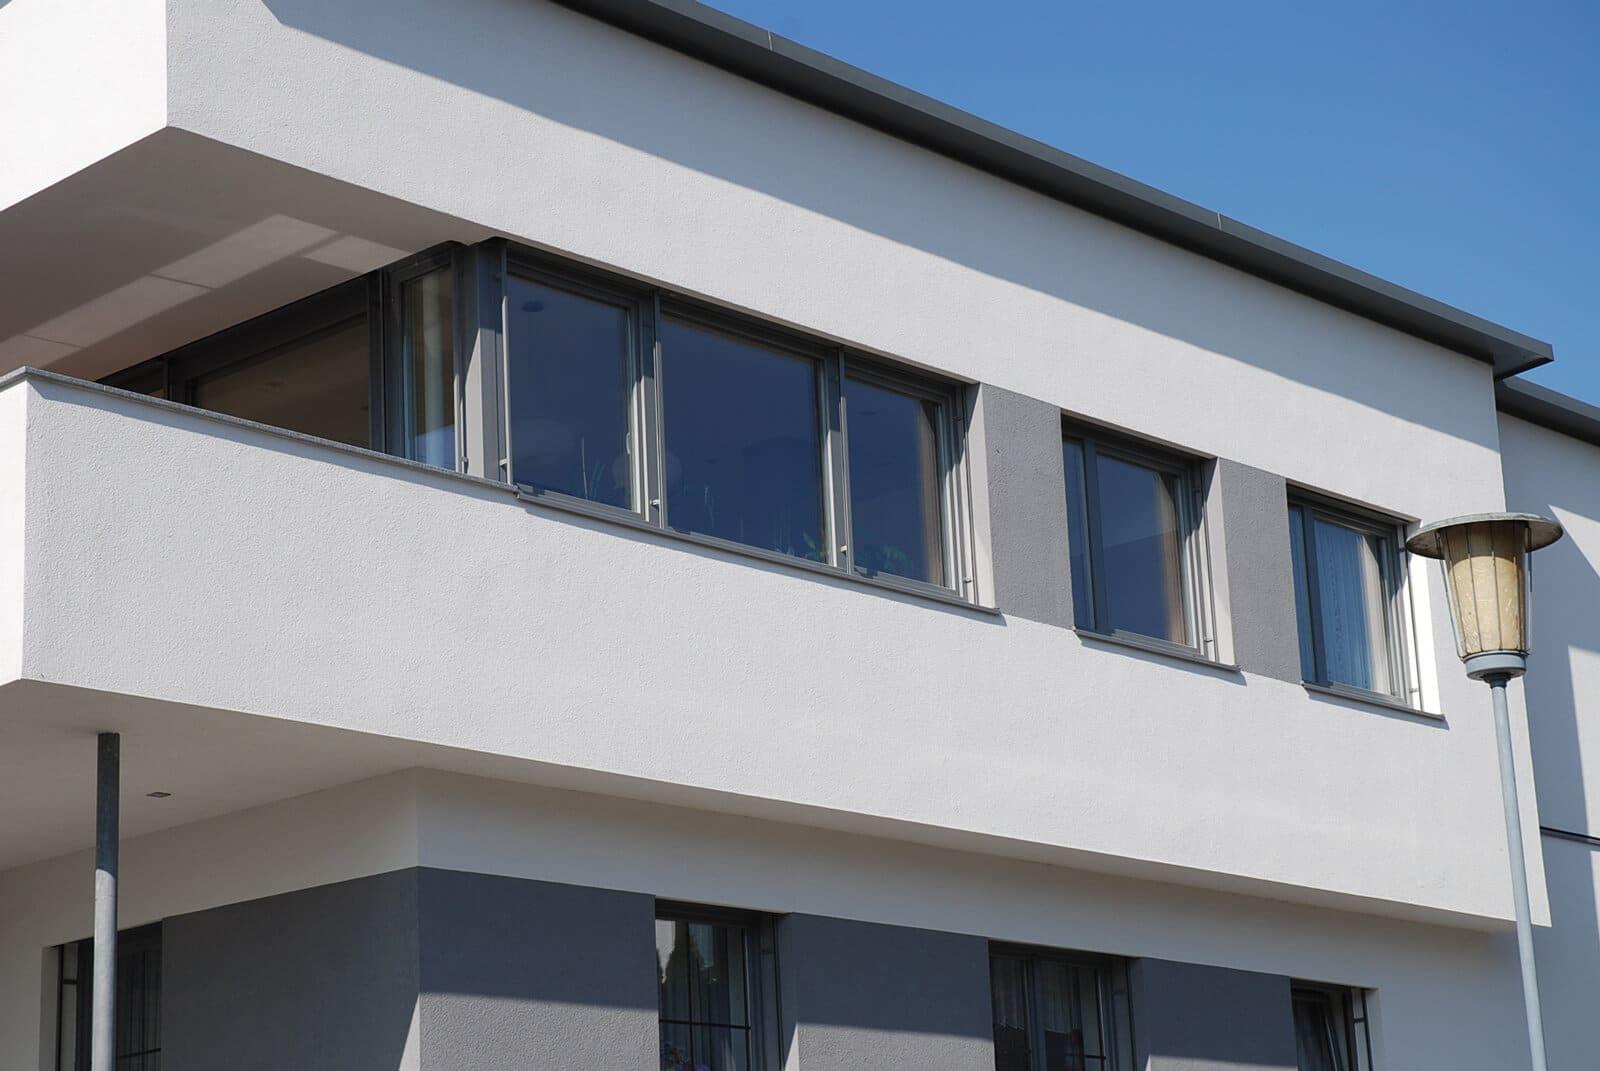 Aluminium-Kunststoff-Fenster in Grau